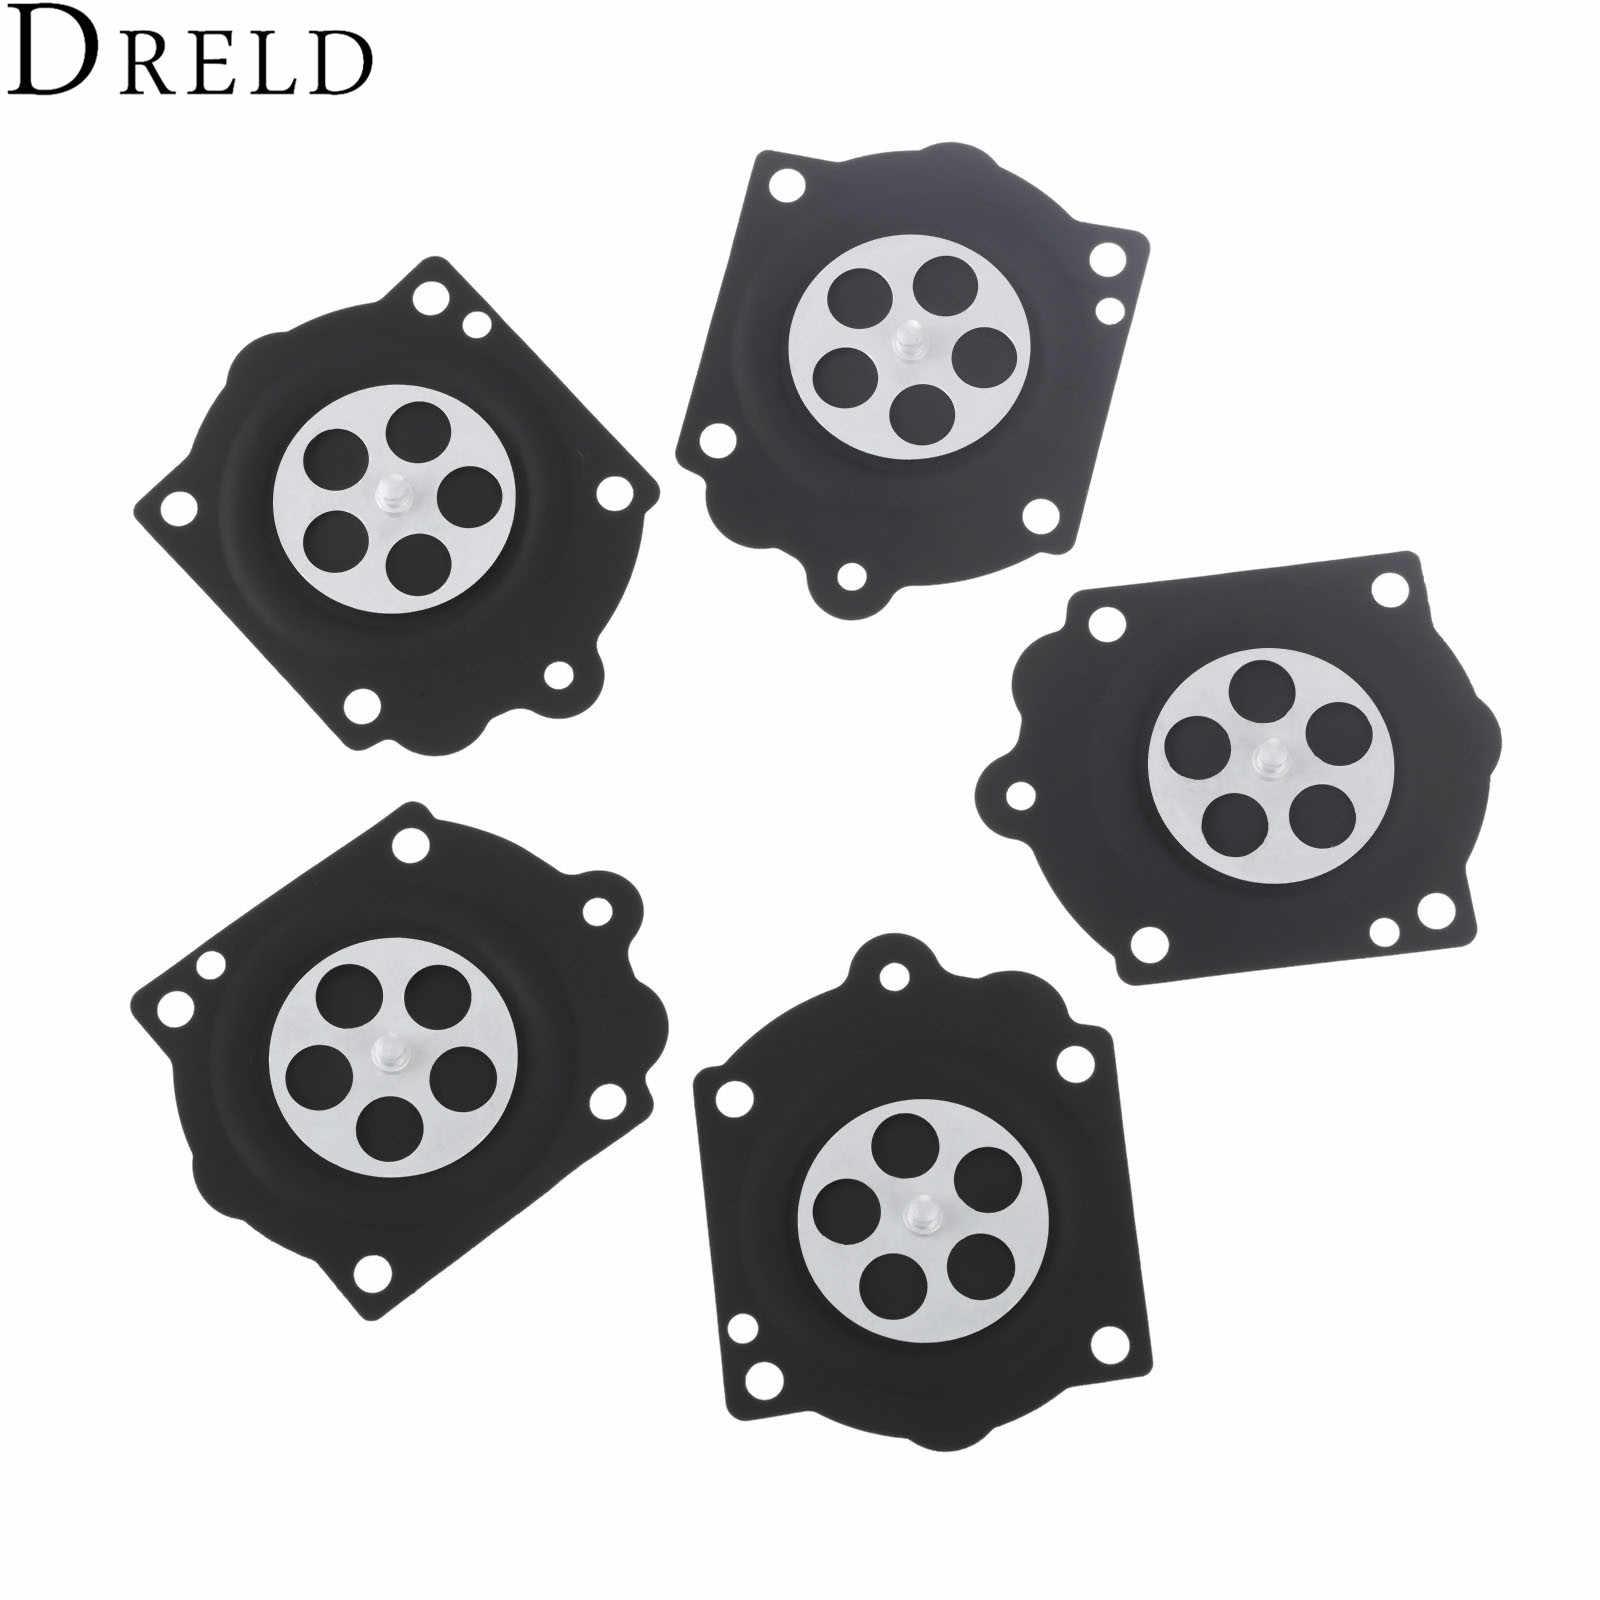 medium resolution of dreld 5pcs carburetor carb rebuild metering diaphragm kit for walbro hdb wg mcculloch pro mac 610